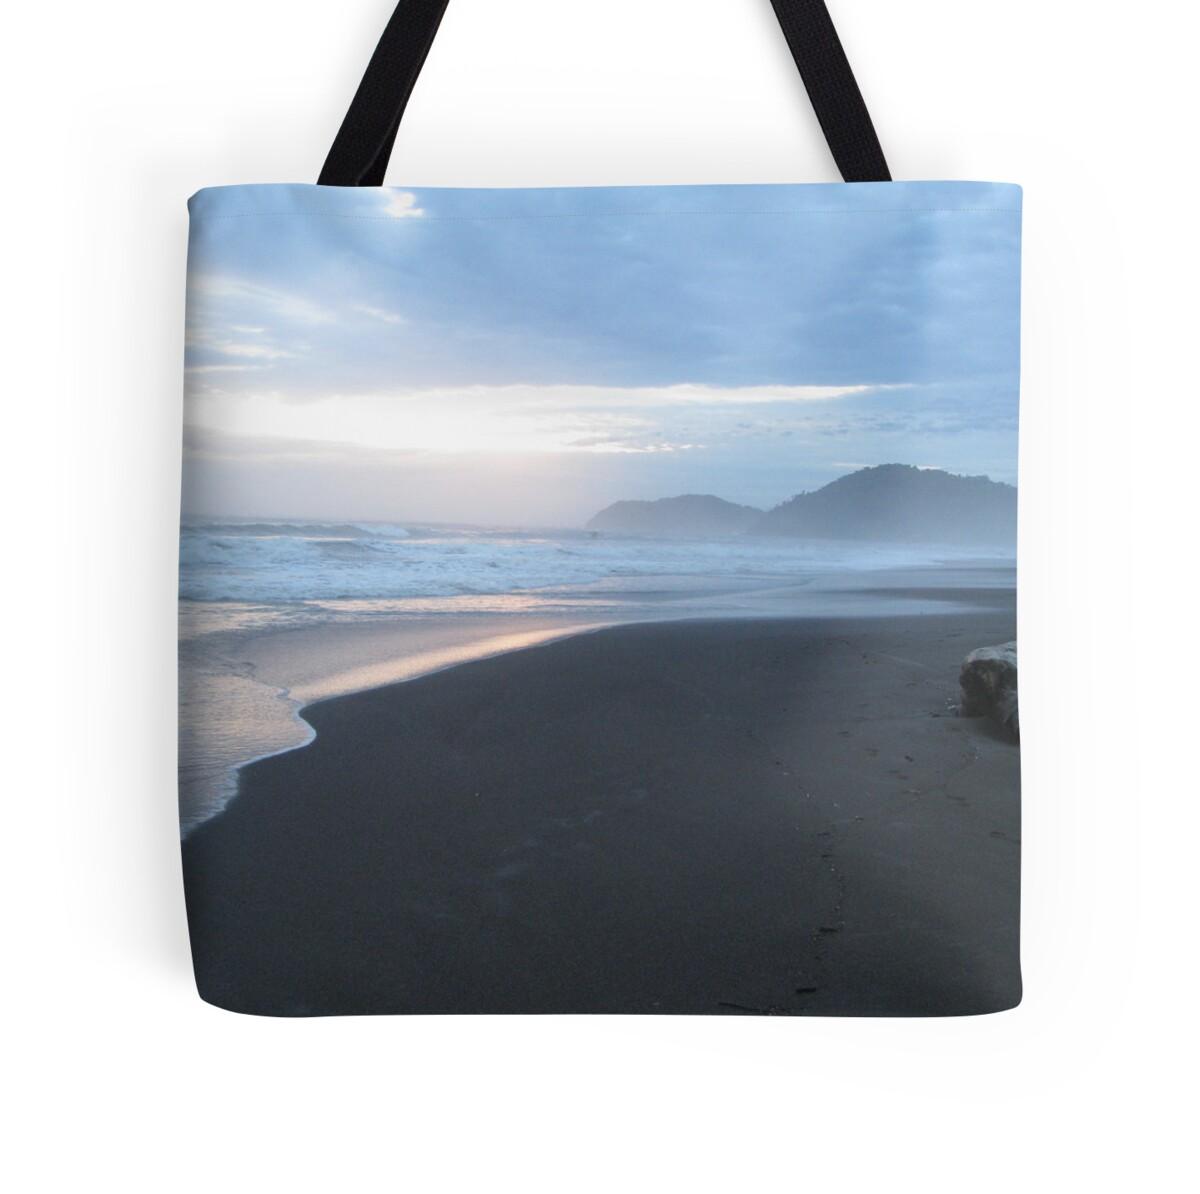 Tote Bag - Sky by VIDA VIDA 6HjQjAwg